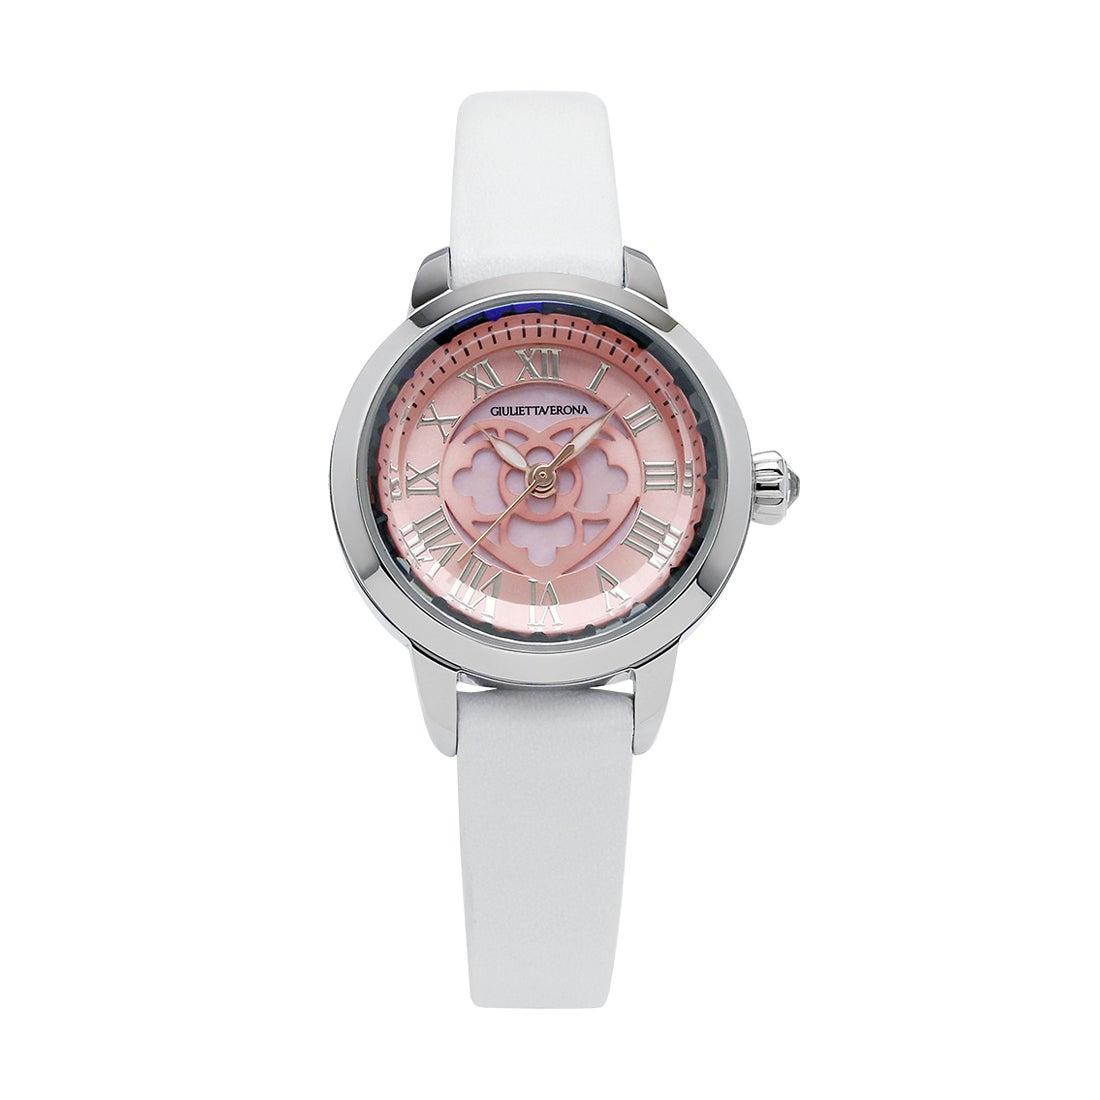 【SAC'S BAR】ジュリエッタヴェローナ GIULIETTAVERONA 腕時計 GV003 LOVE VERONA ピンク×ホワイト